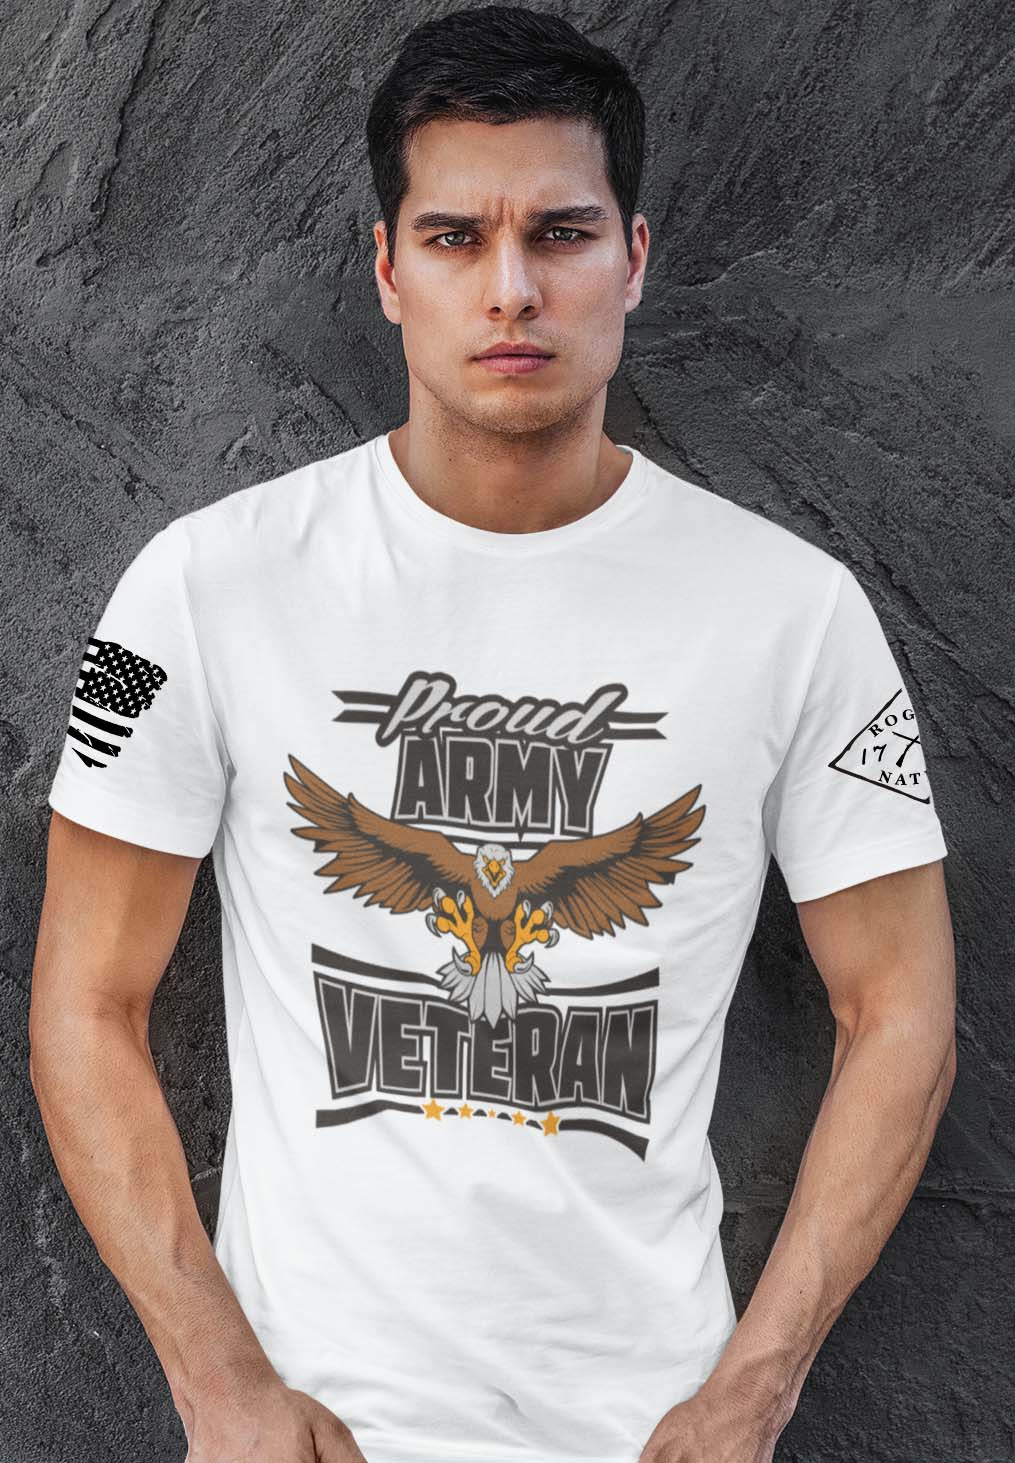 Army Veteran on Men's White Shirt